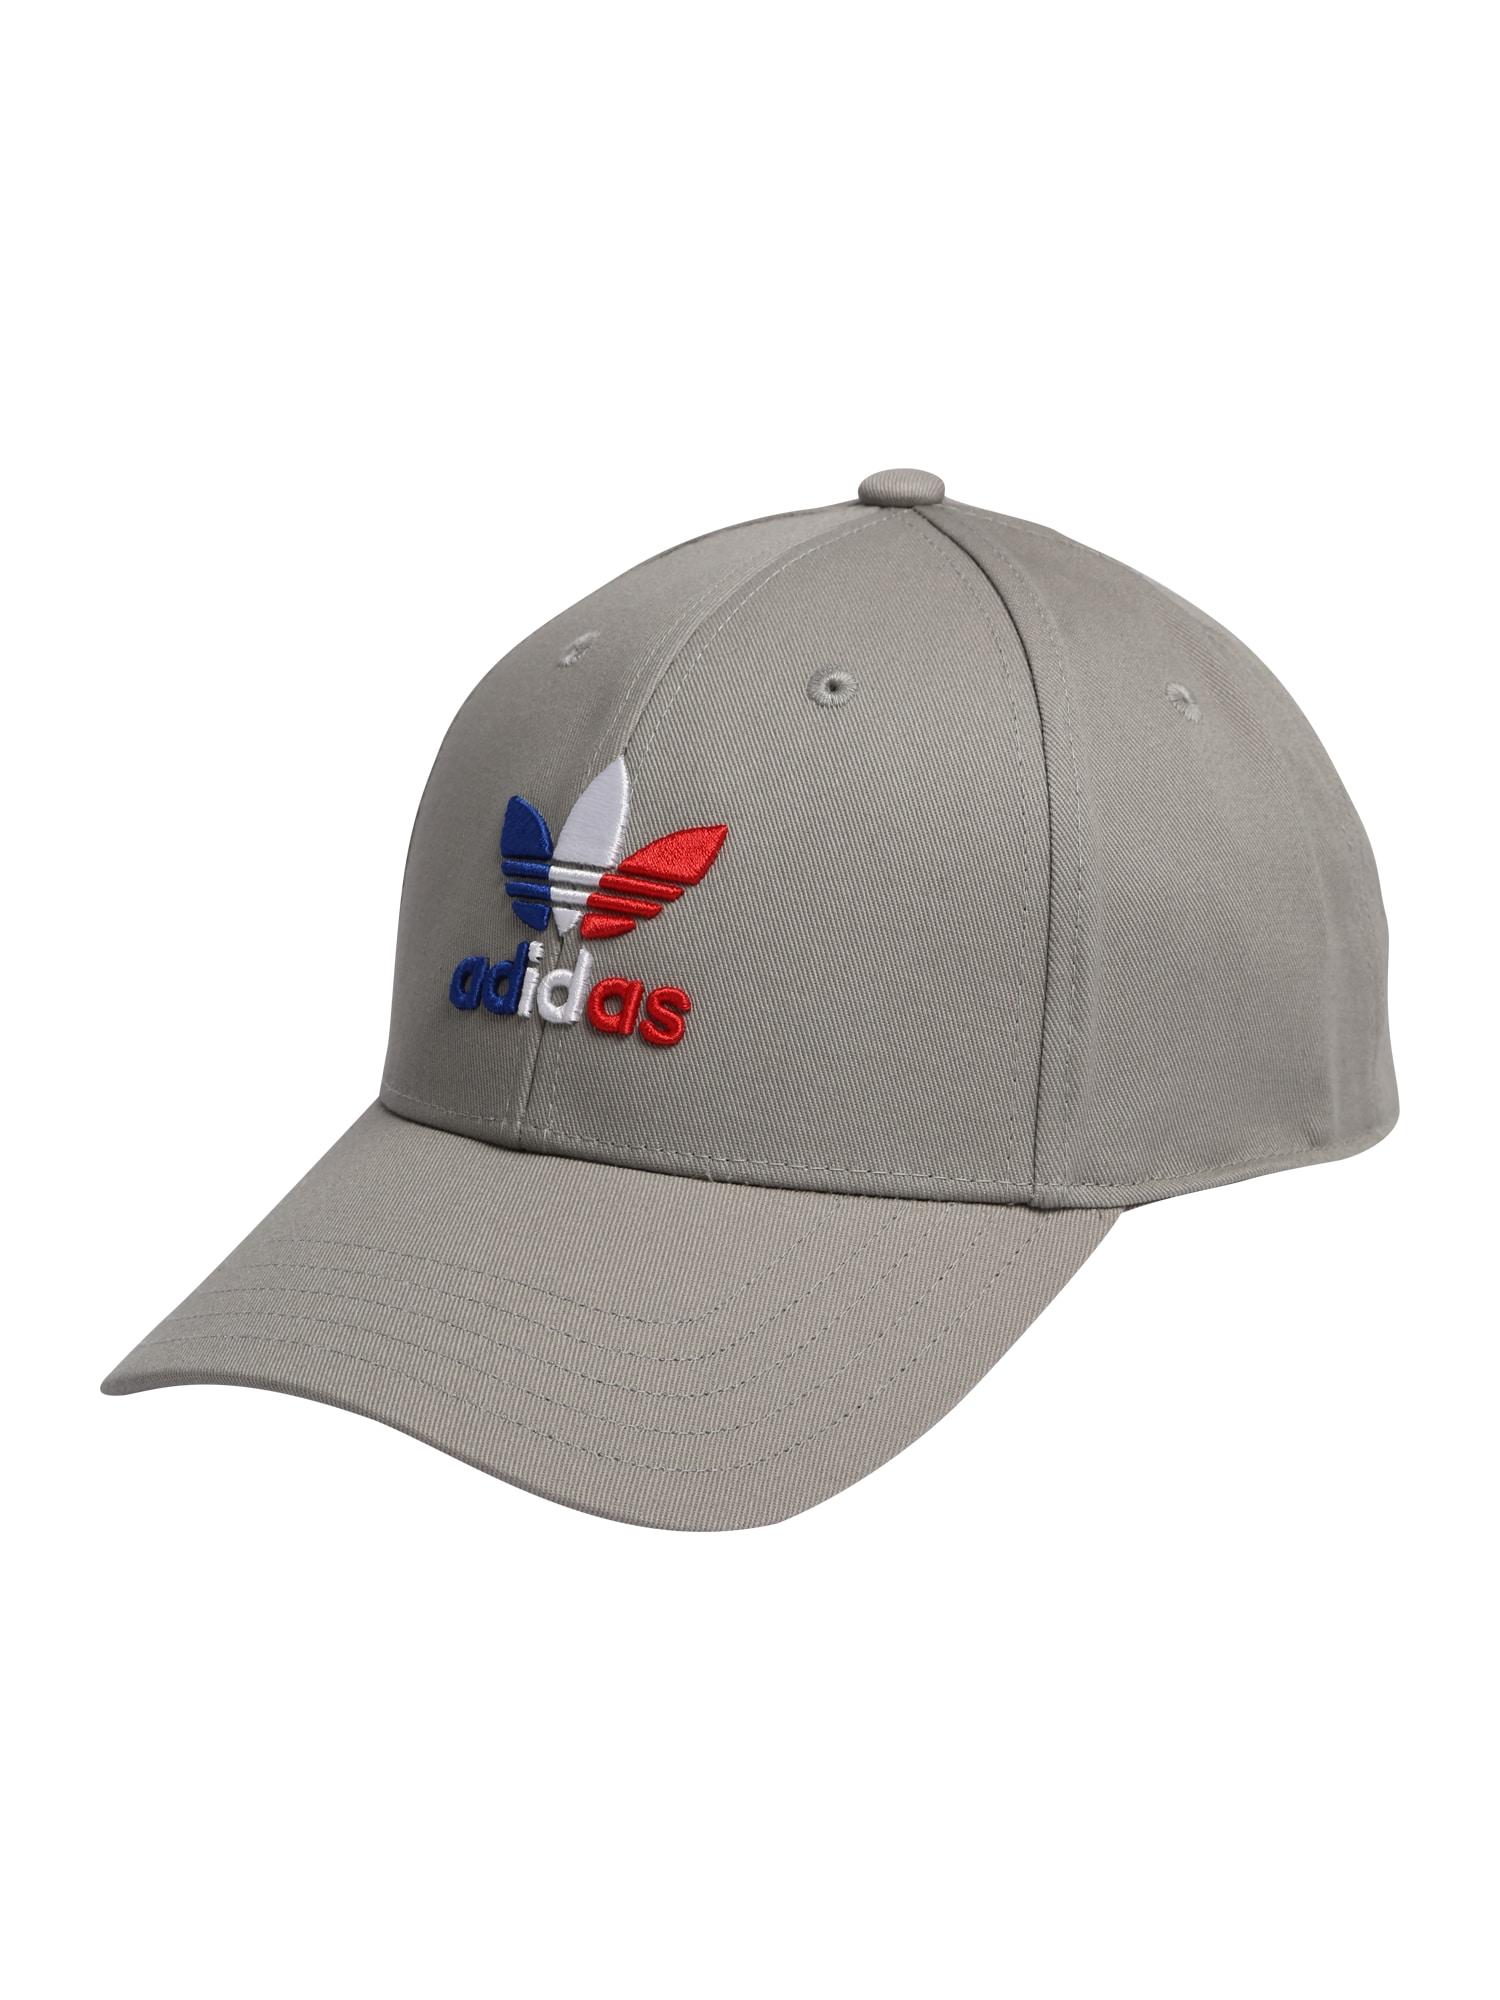 ADIDAS ORIGINALS Kepurė pilka / raudona / balta / mėlyna